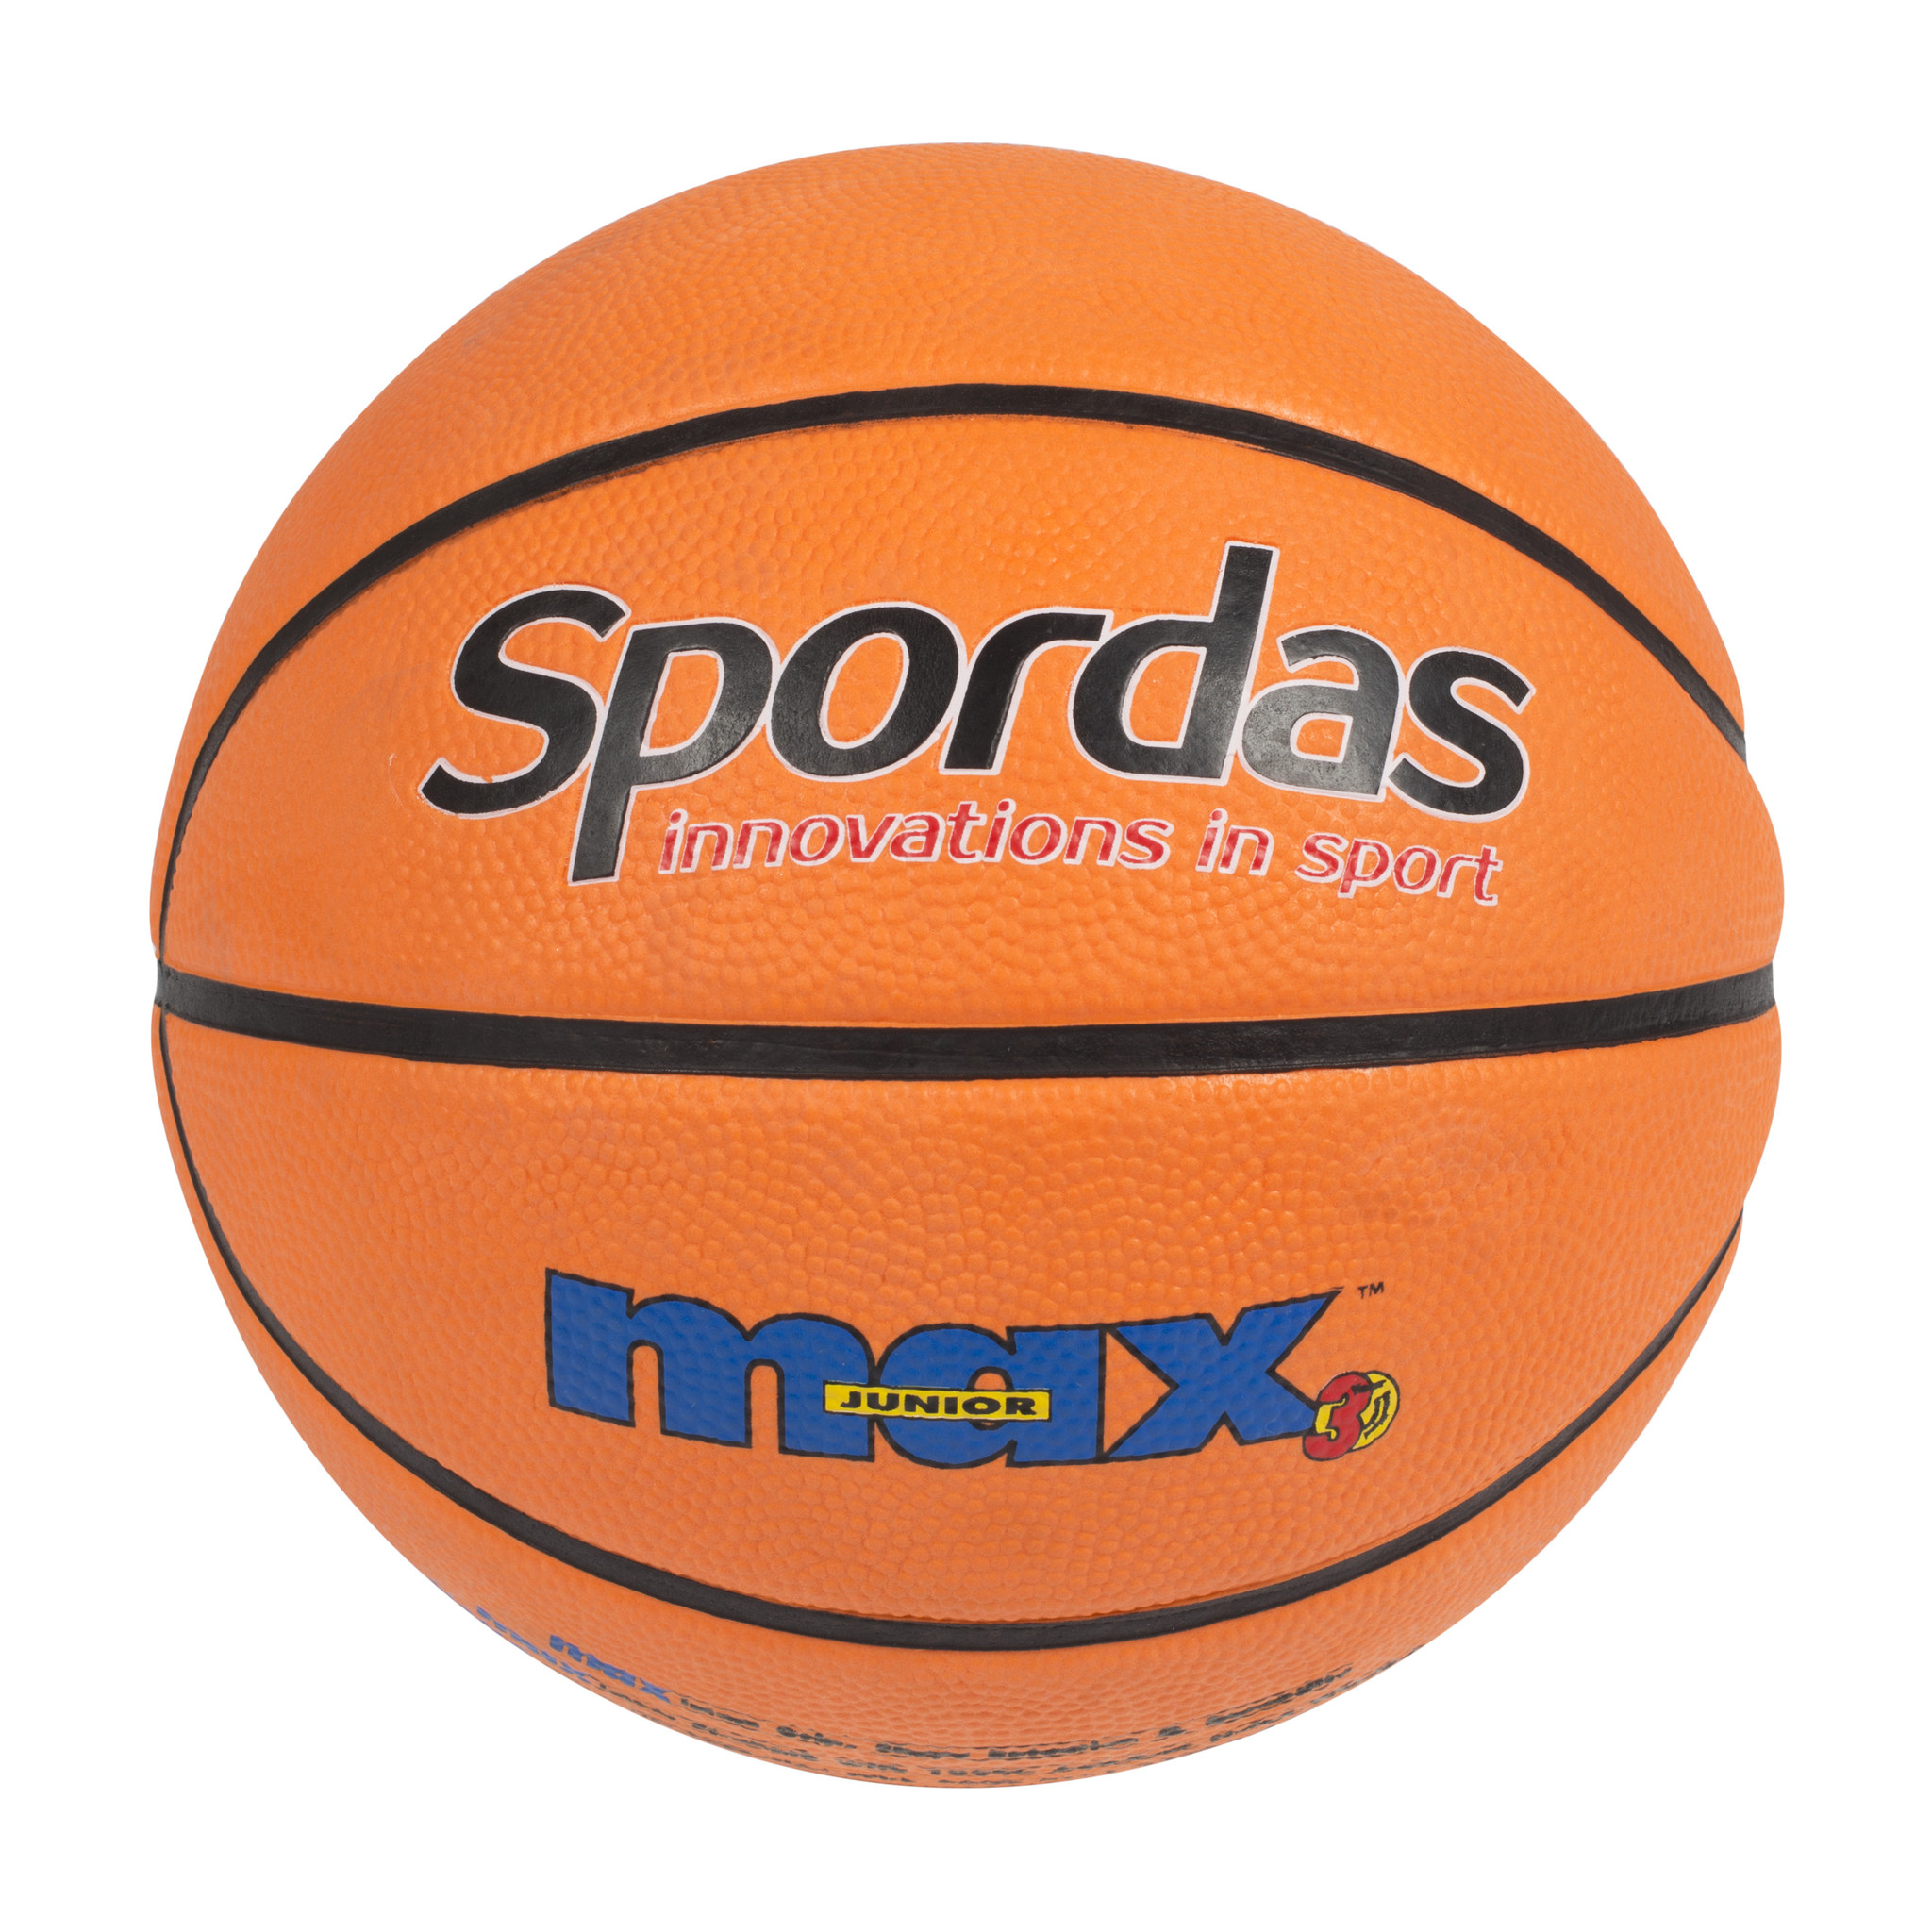 Spordas Max Basketbal - Oranje - Maat 5-1